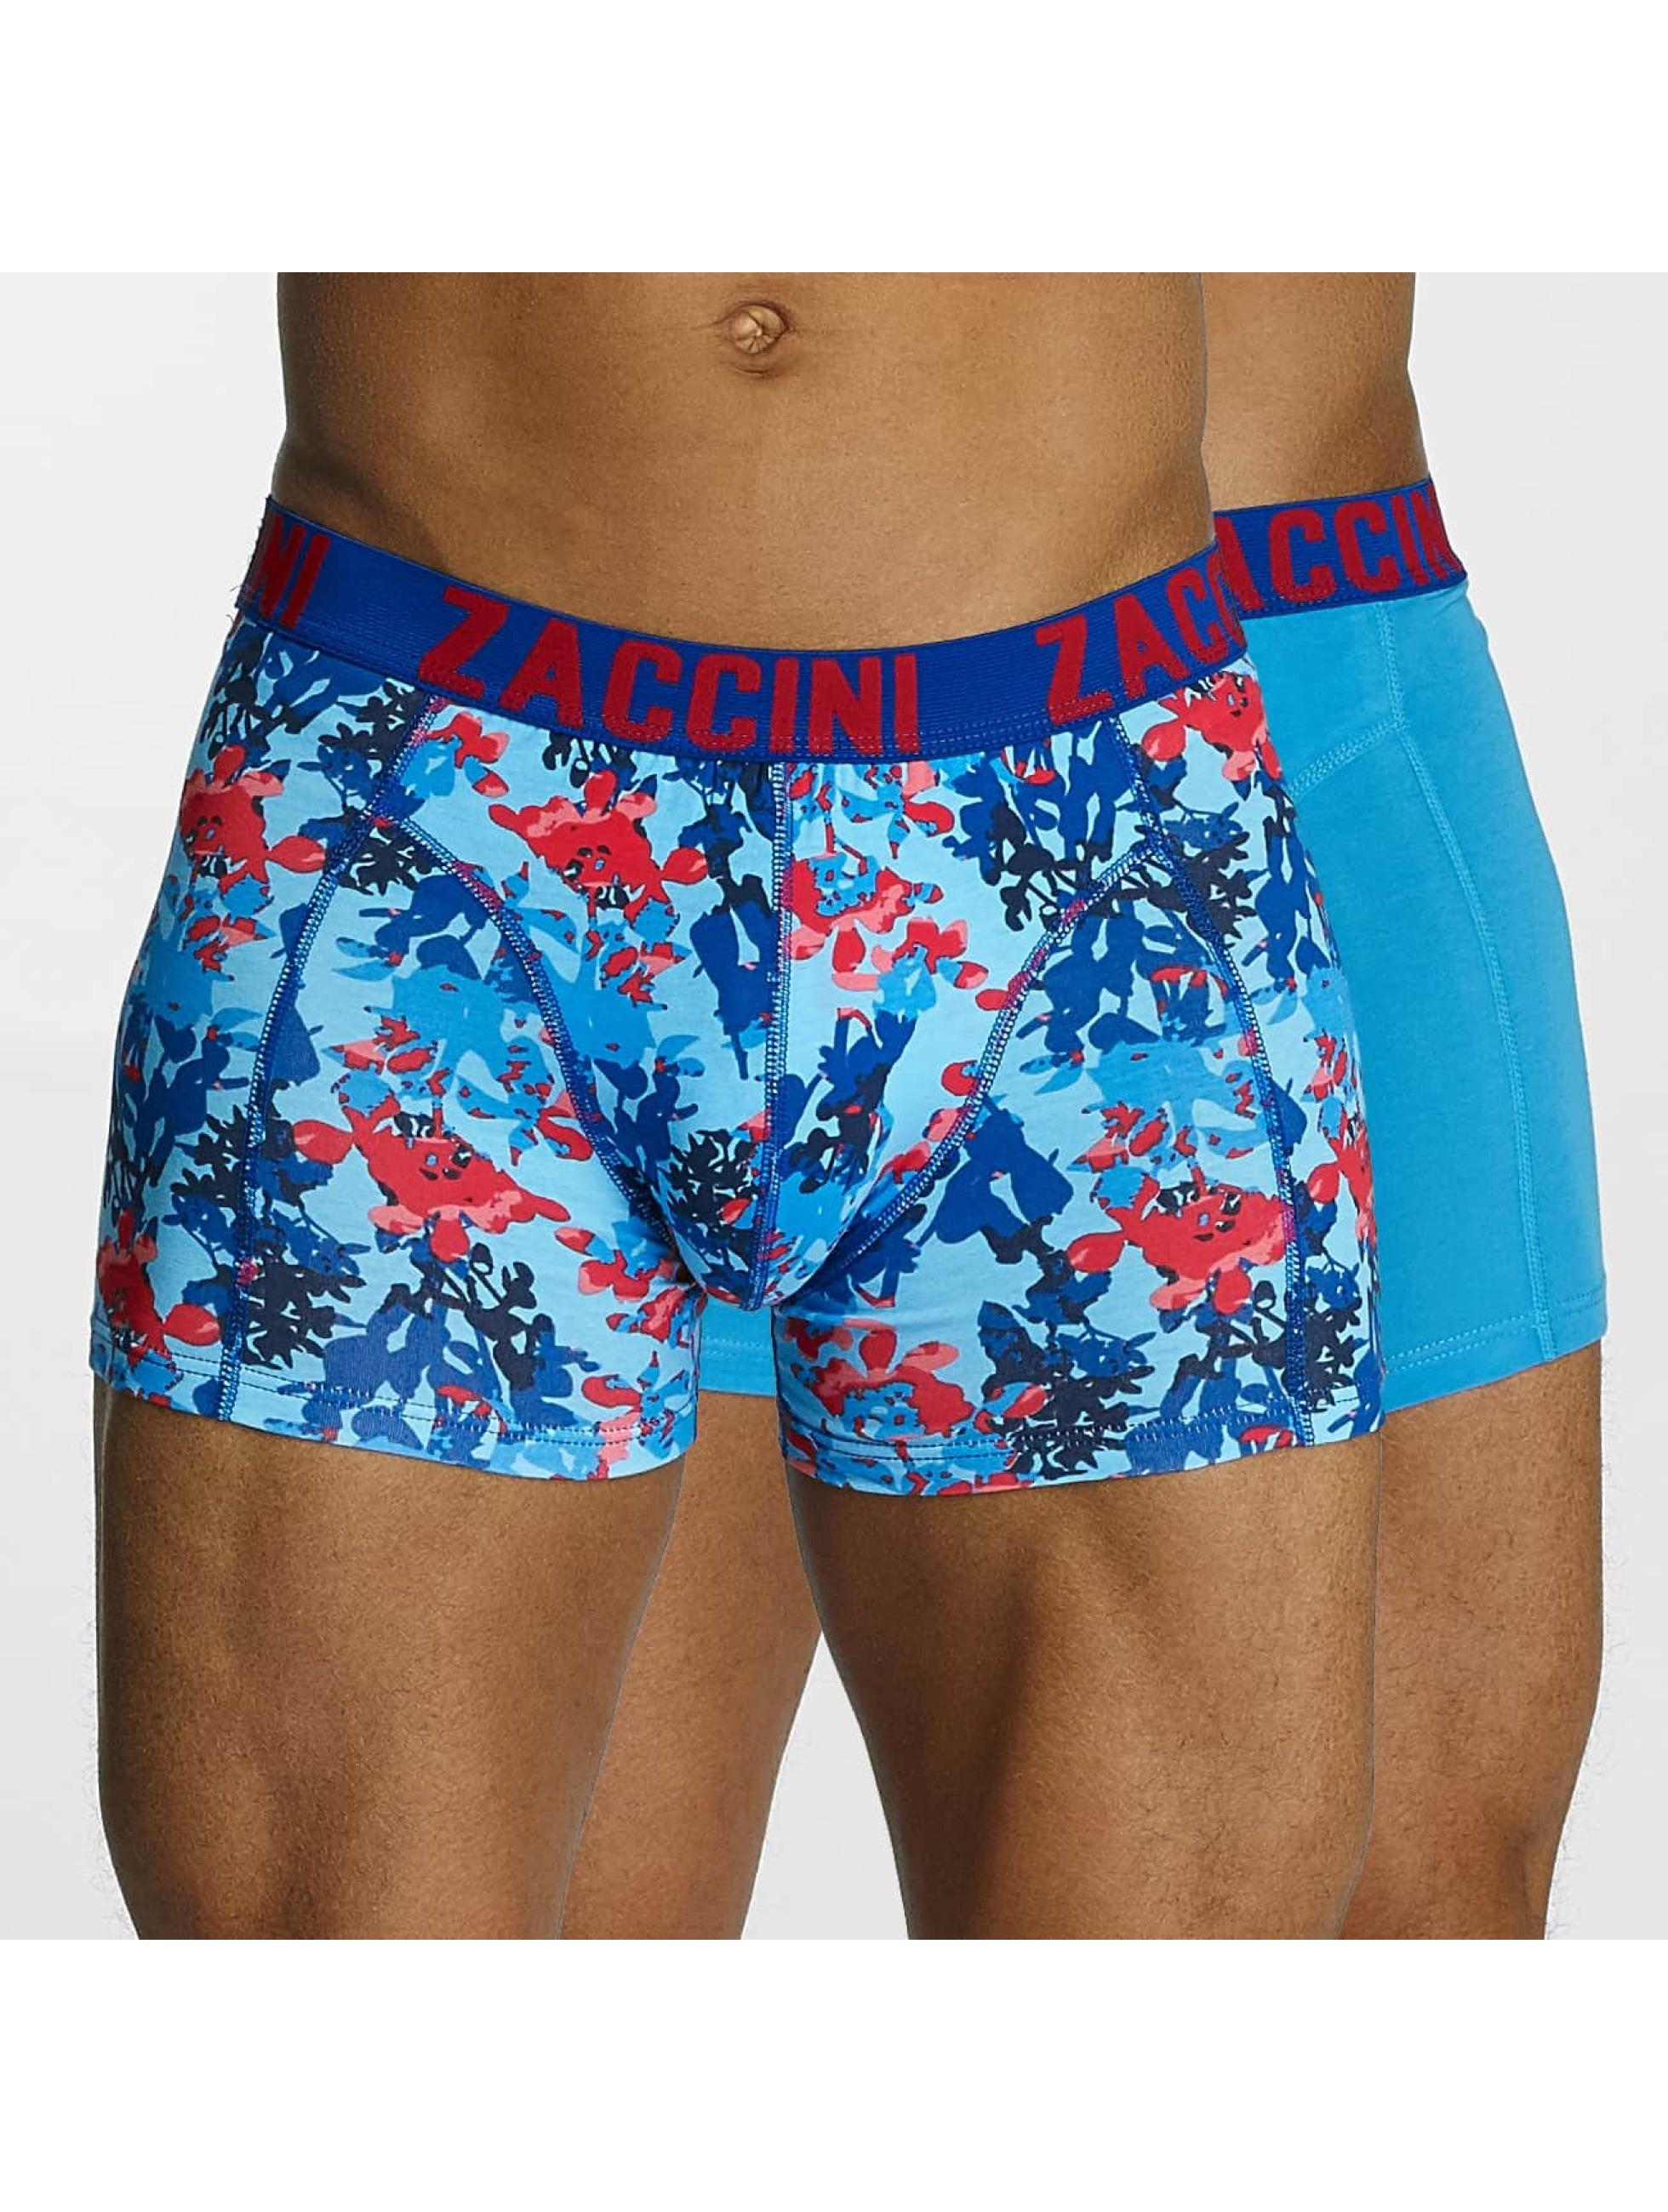 Zaccini Boxerky Painted Spring modrý